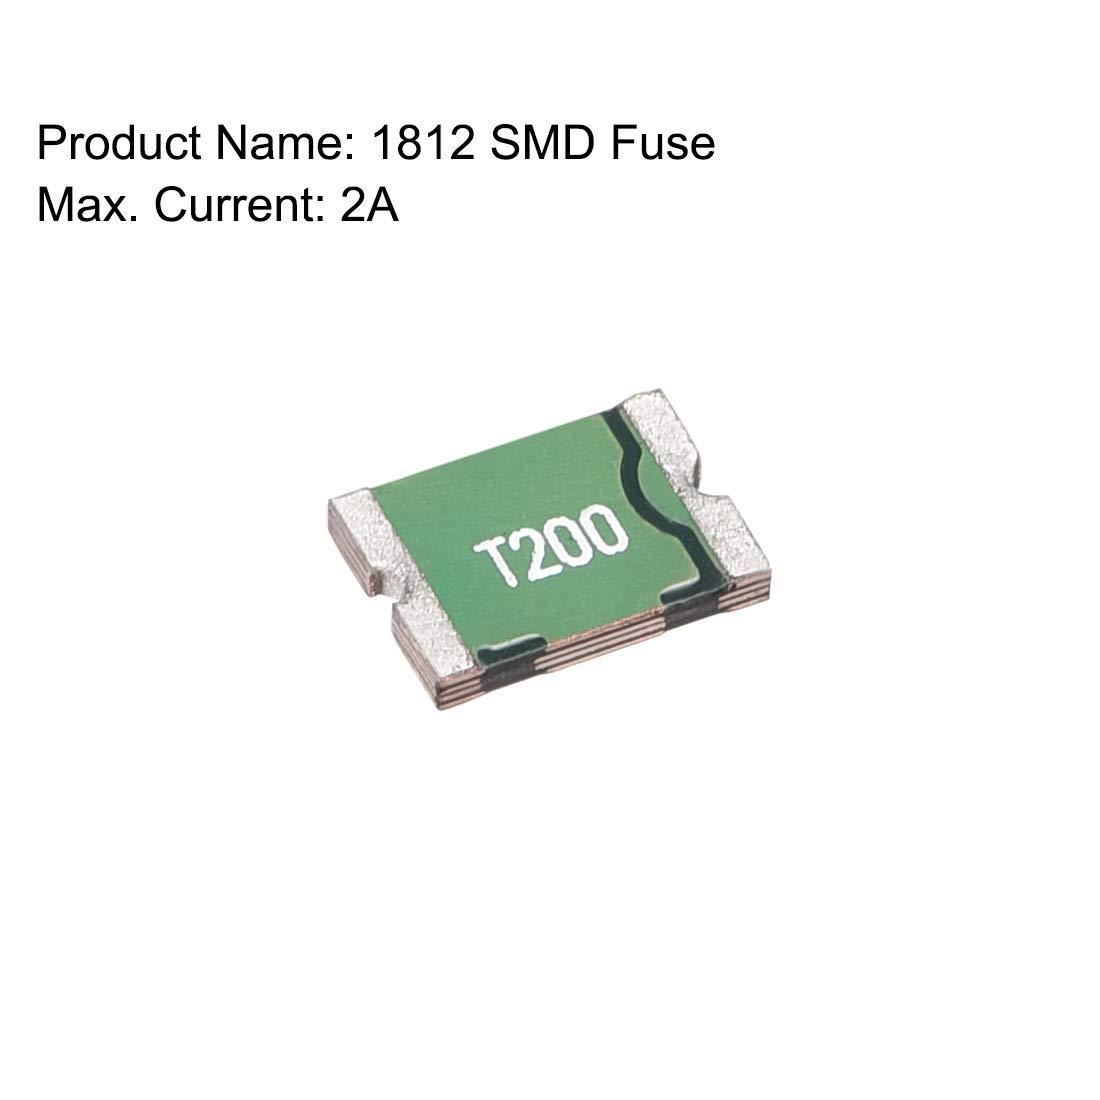 sourcing map Fusible Reiniciable SMD 1812 de Chip de montaje superficial de 16V 2A 50 unidades